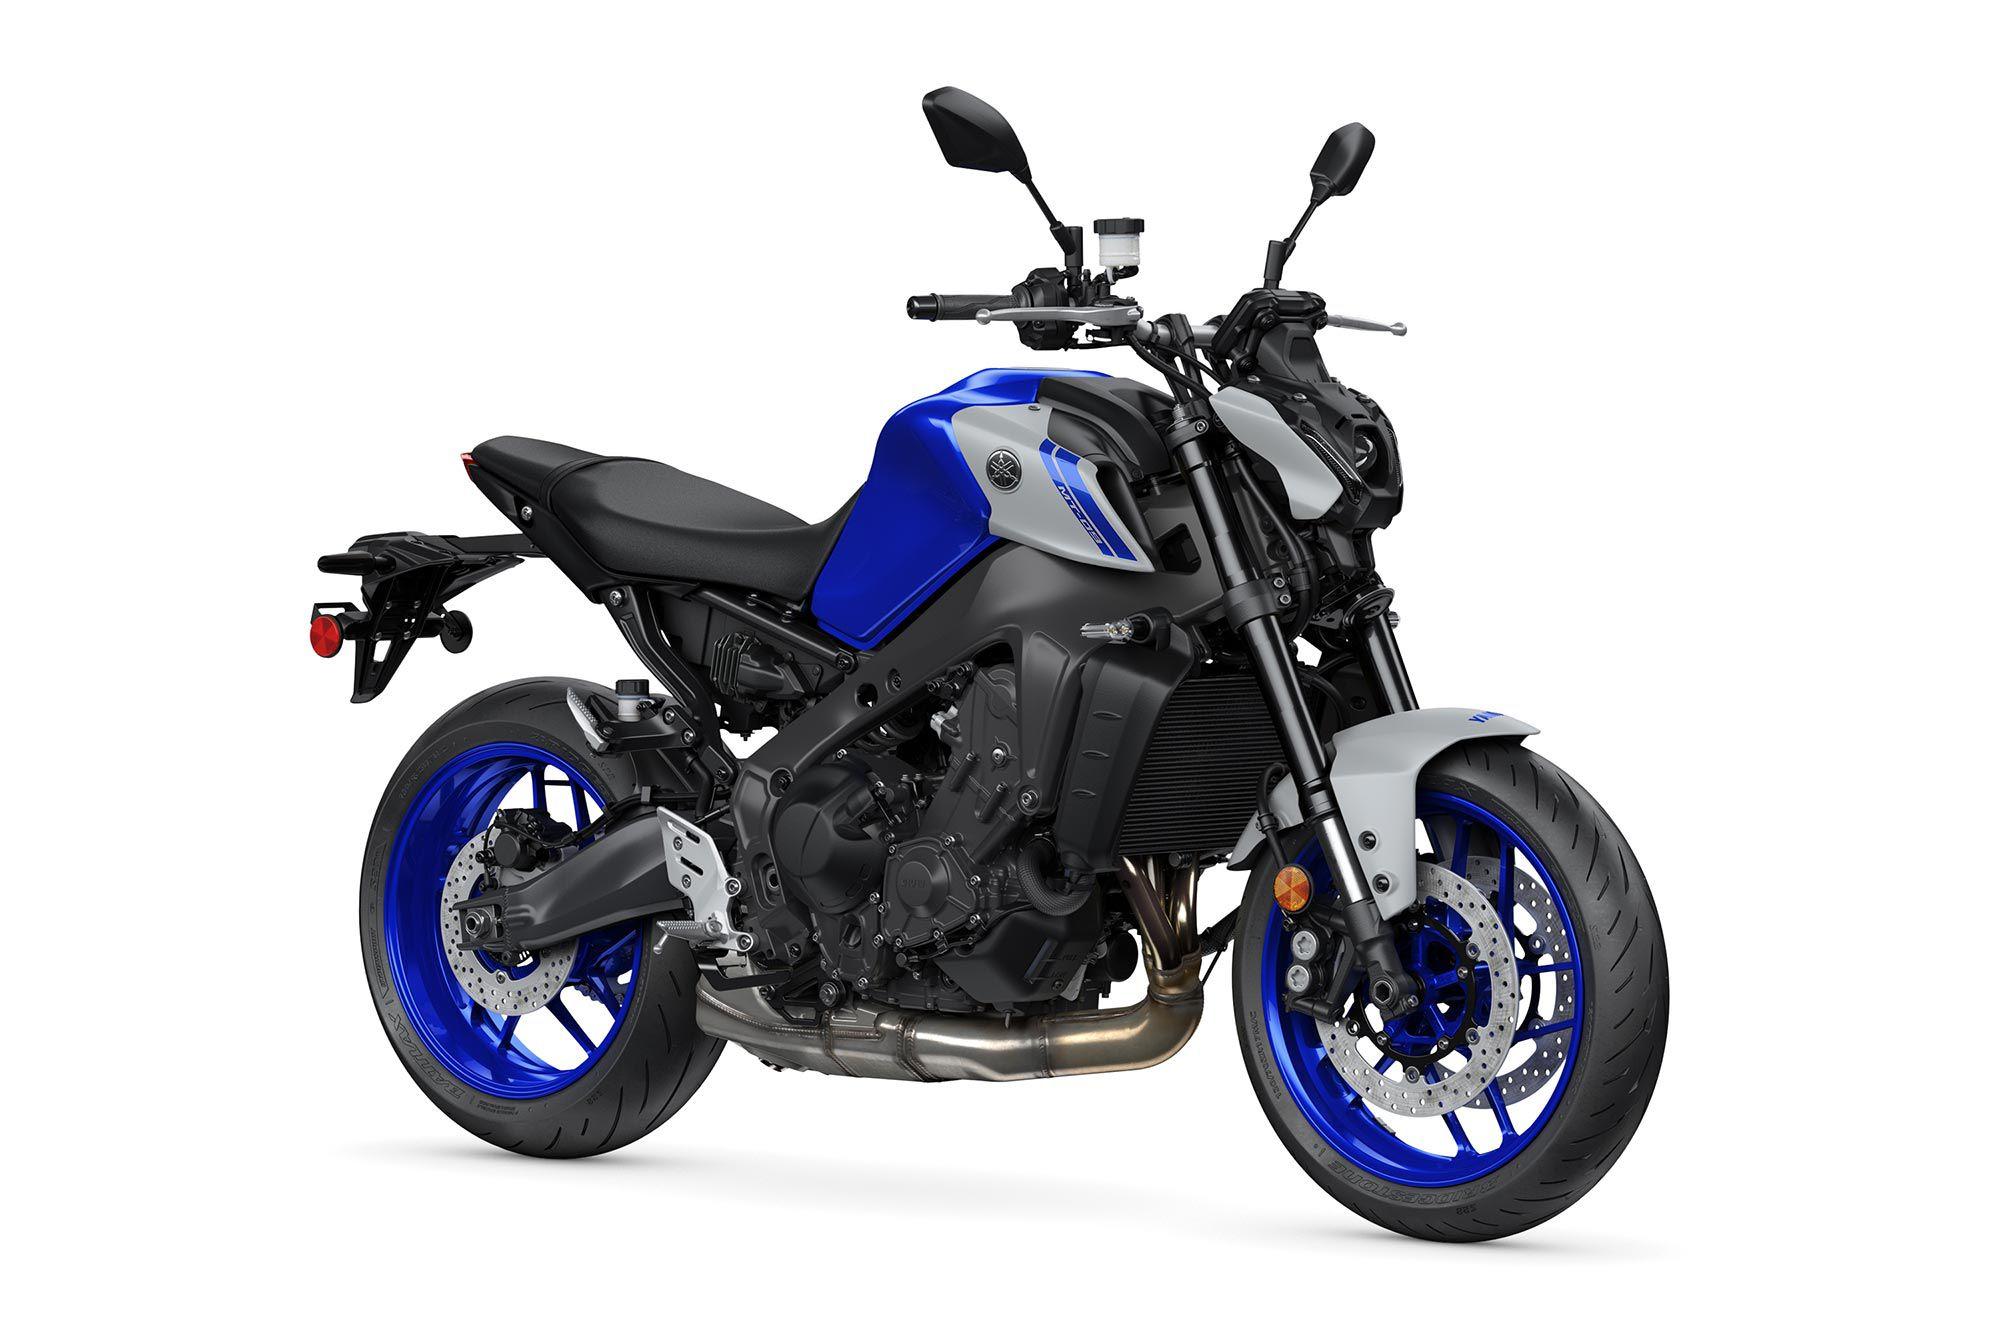 2021 Yamaha MT-09 (Team Yamaha Blue).